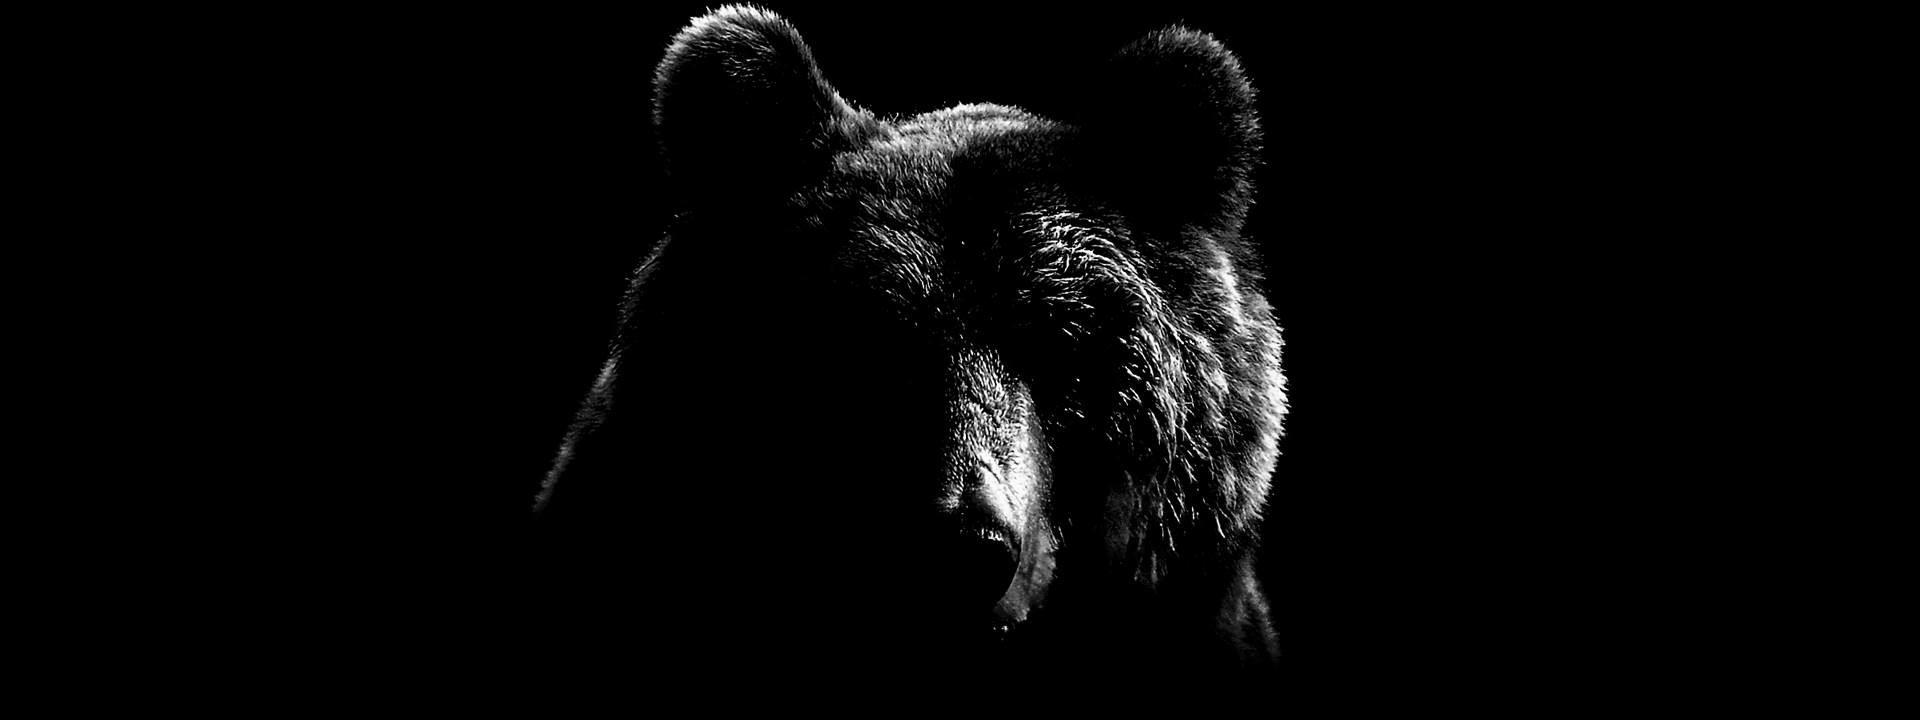 Silhouette of the VCCP Bear